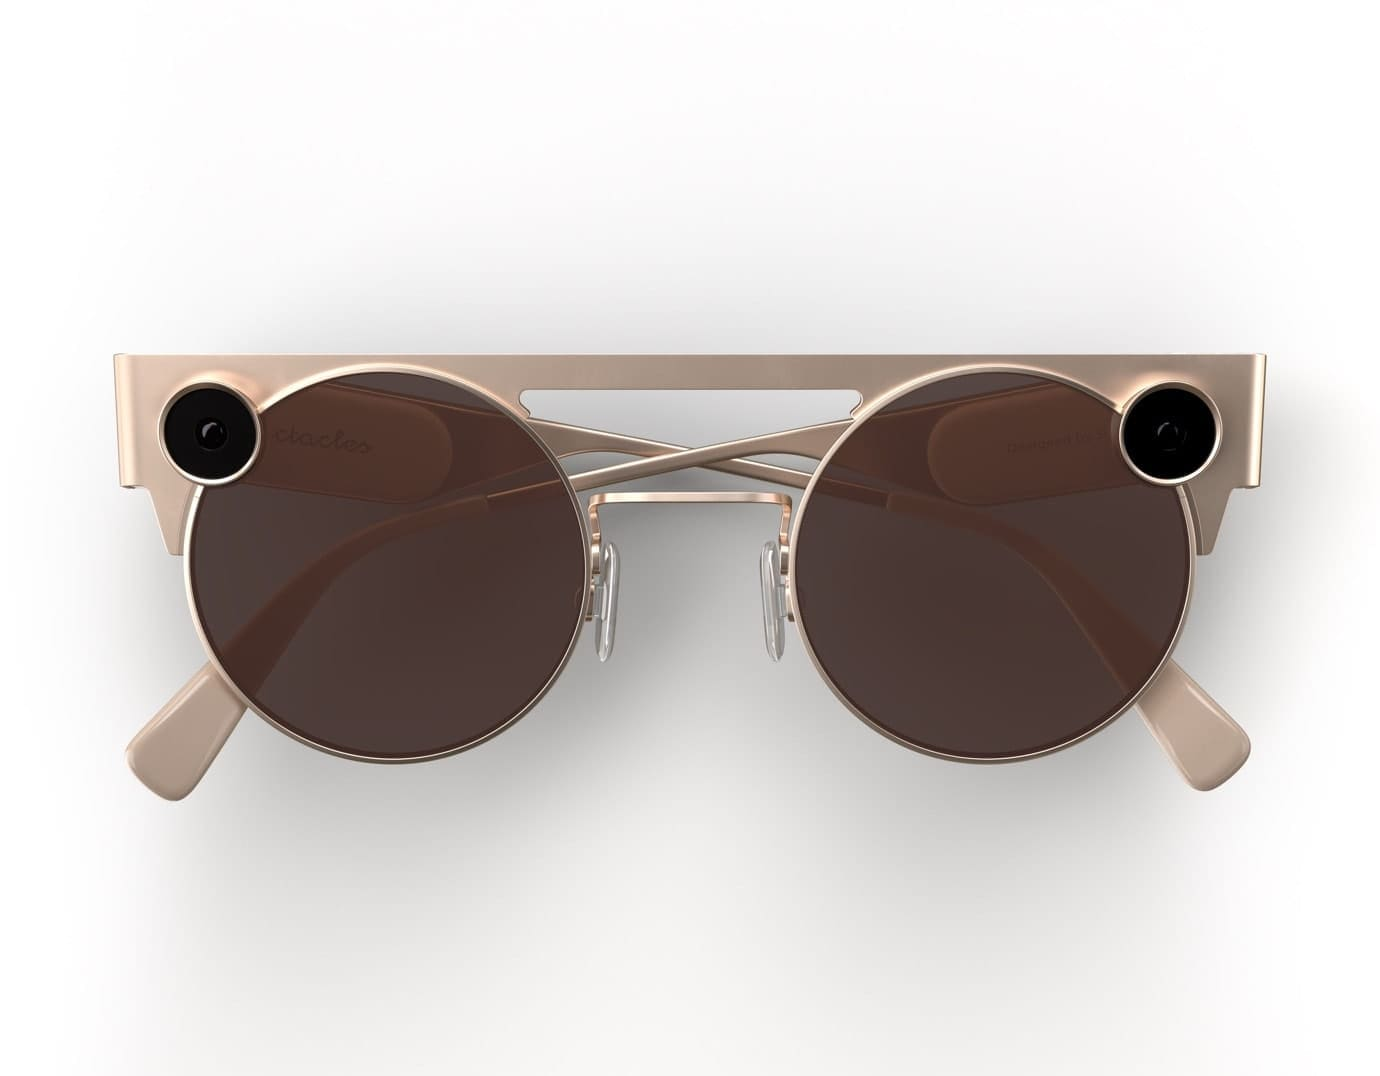 Okulary Snapchat Spectacles 3 - 1